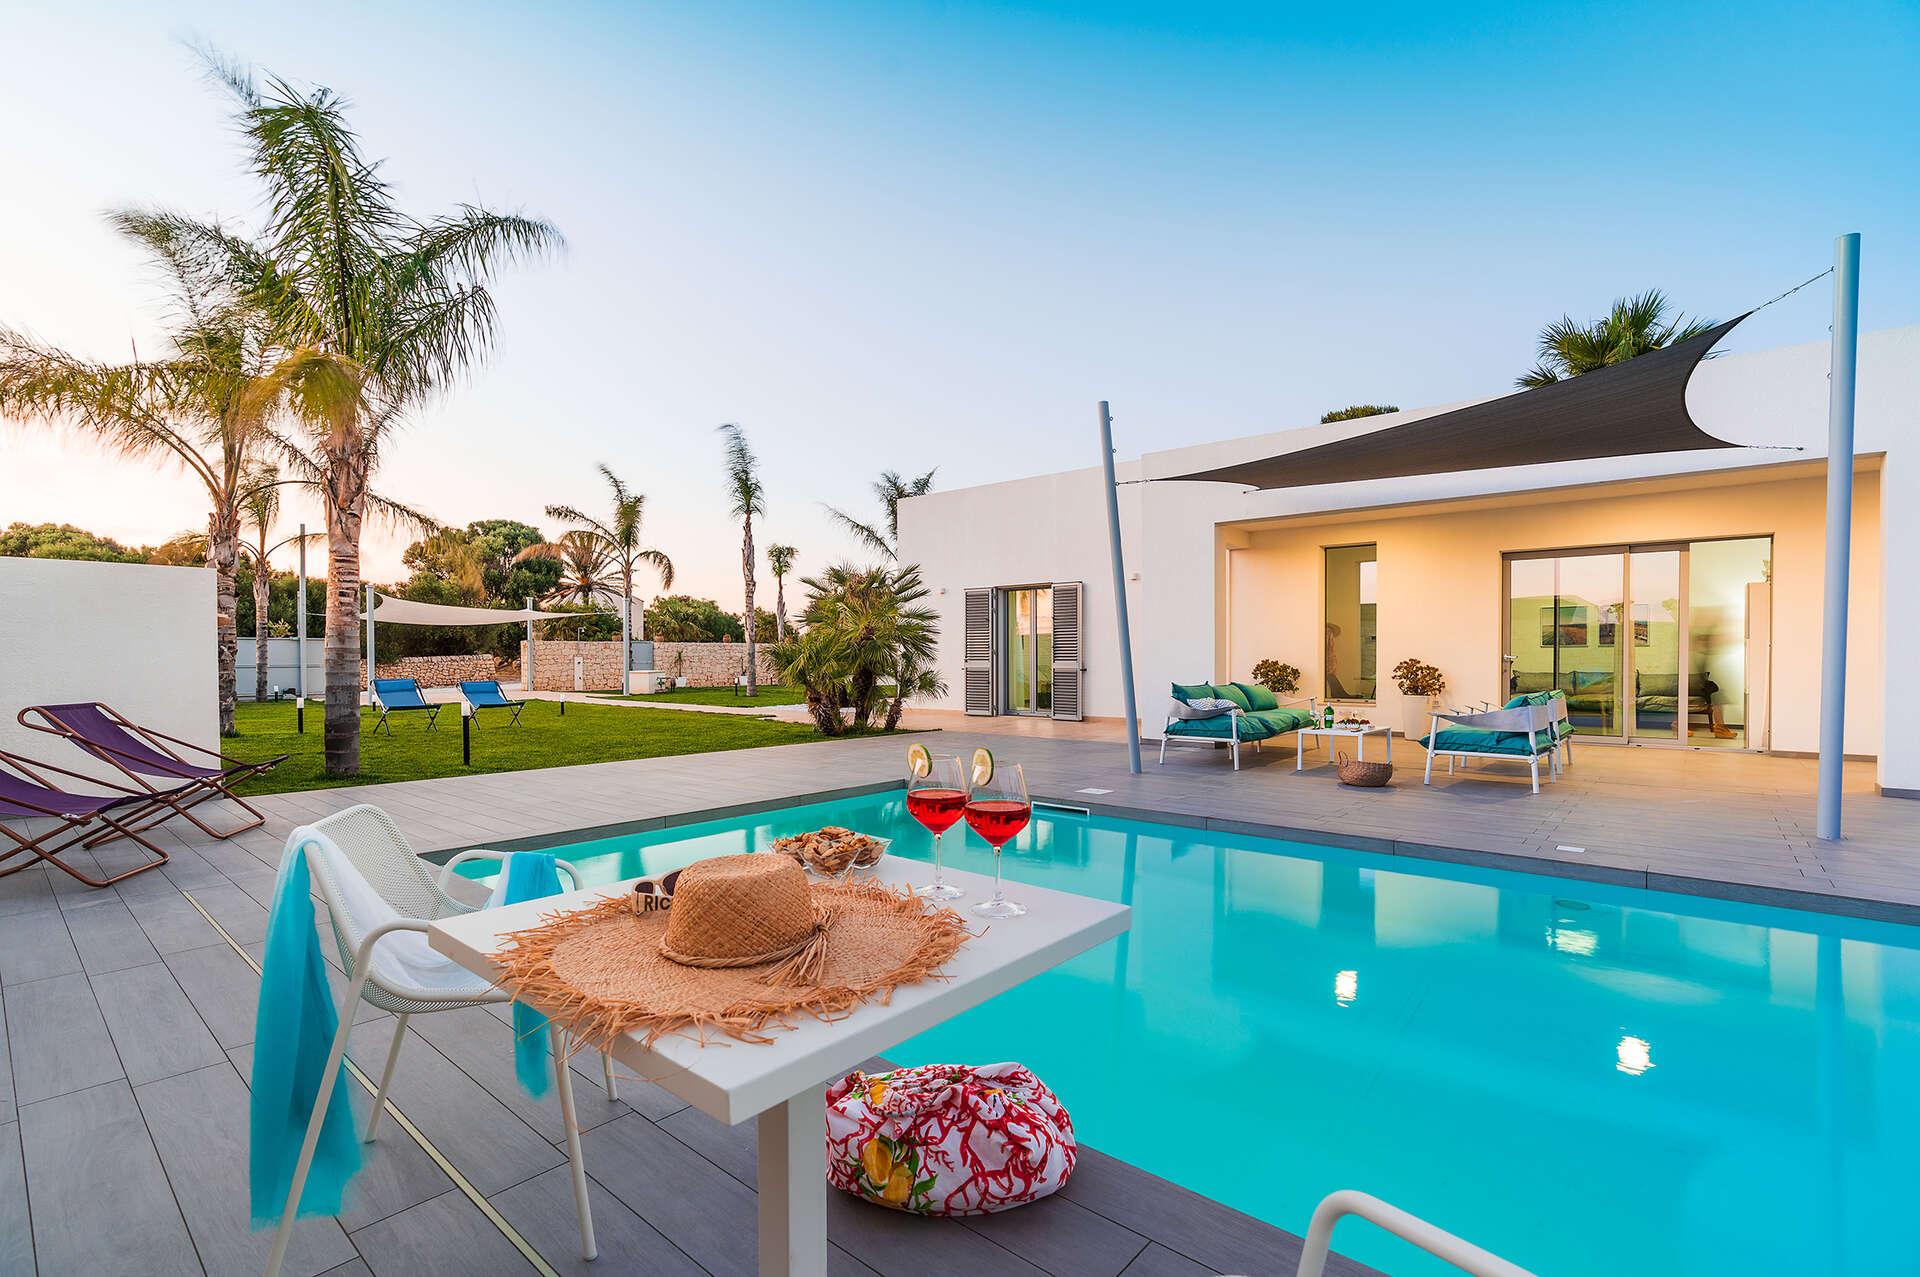 Luxury vacation rentals europe - Italy - Sicily - Pachino - Villa Nica - Image 1/46